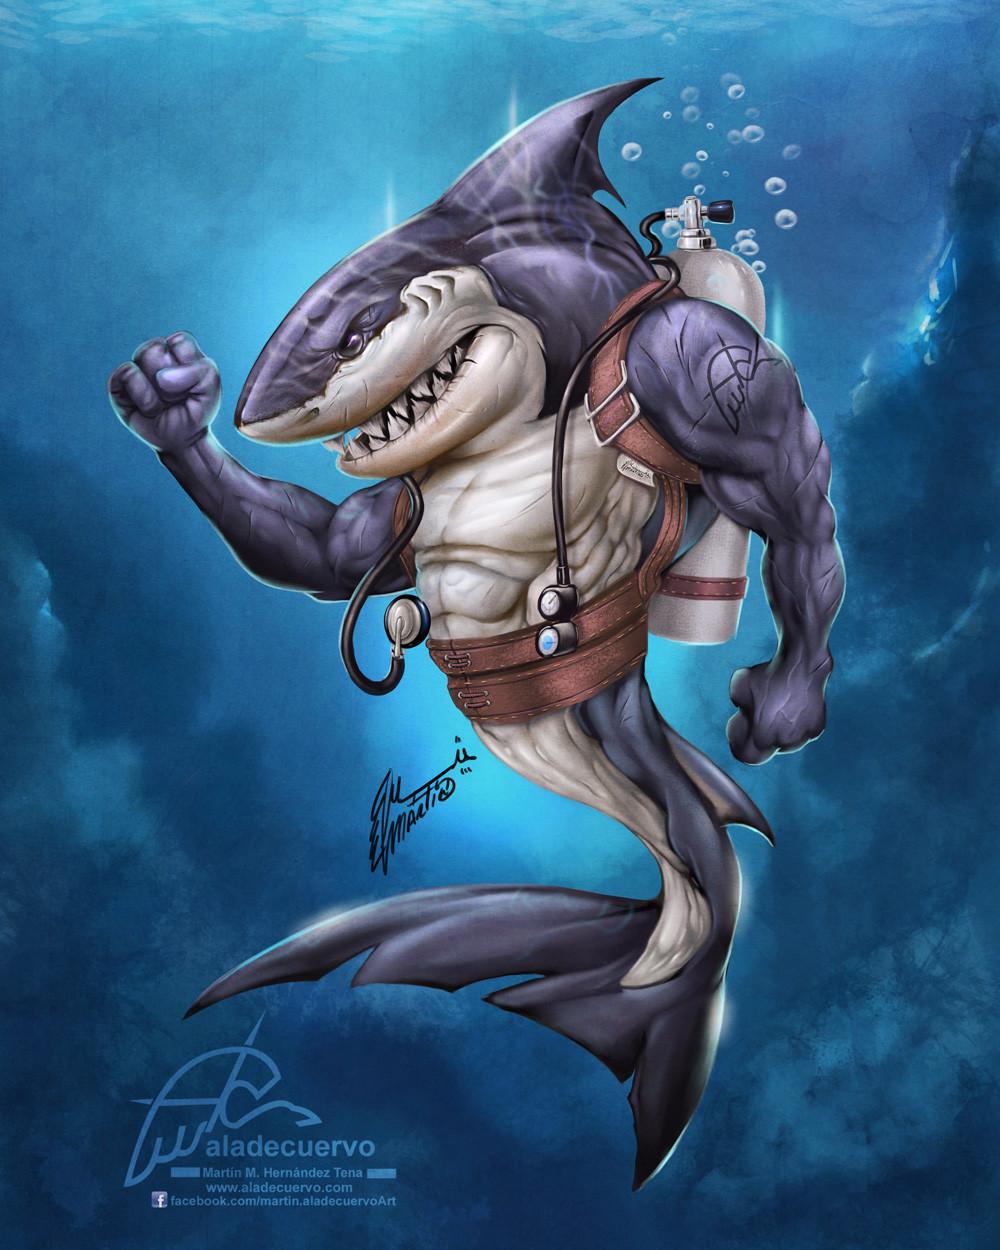 крутые картинки акул качков где